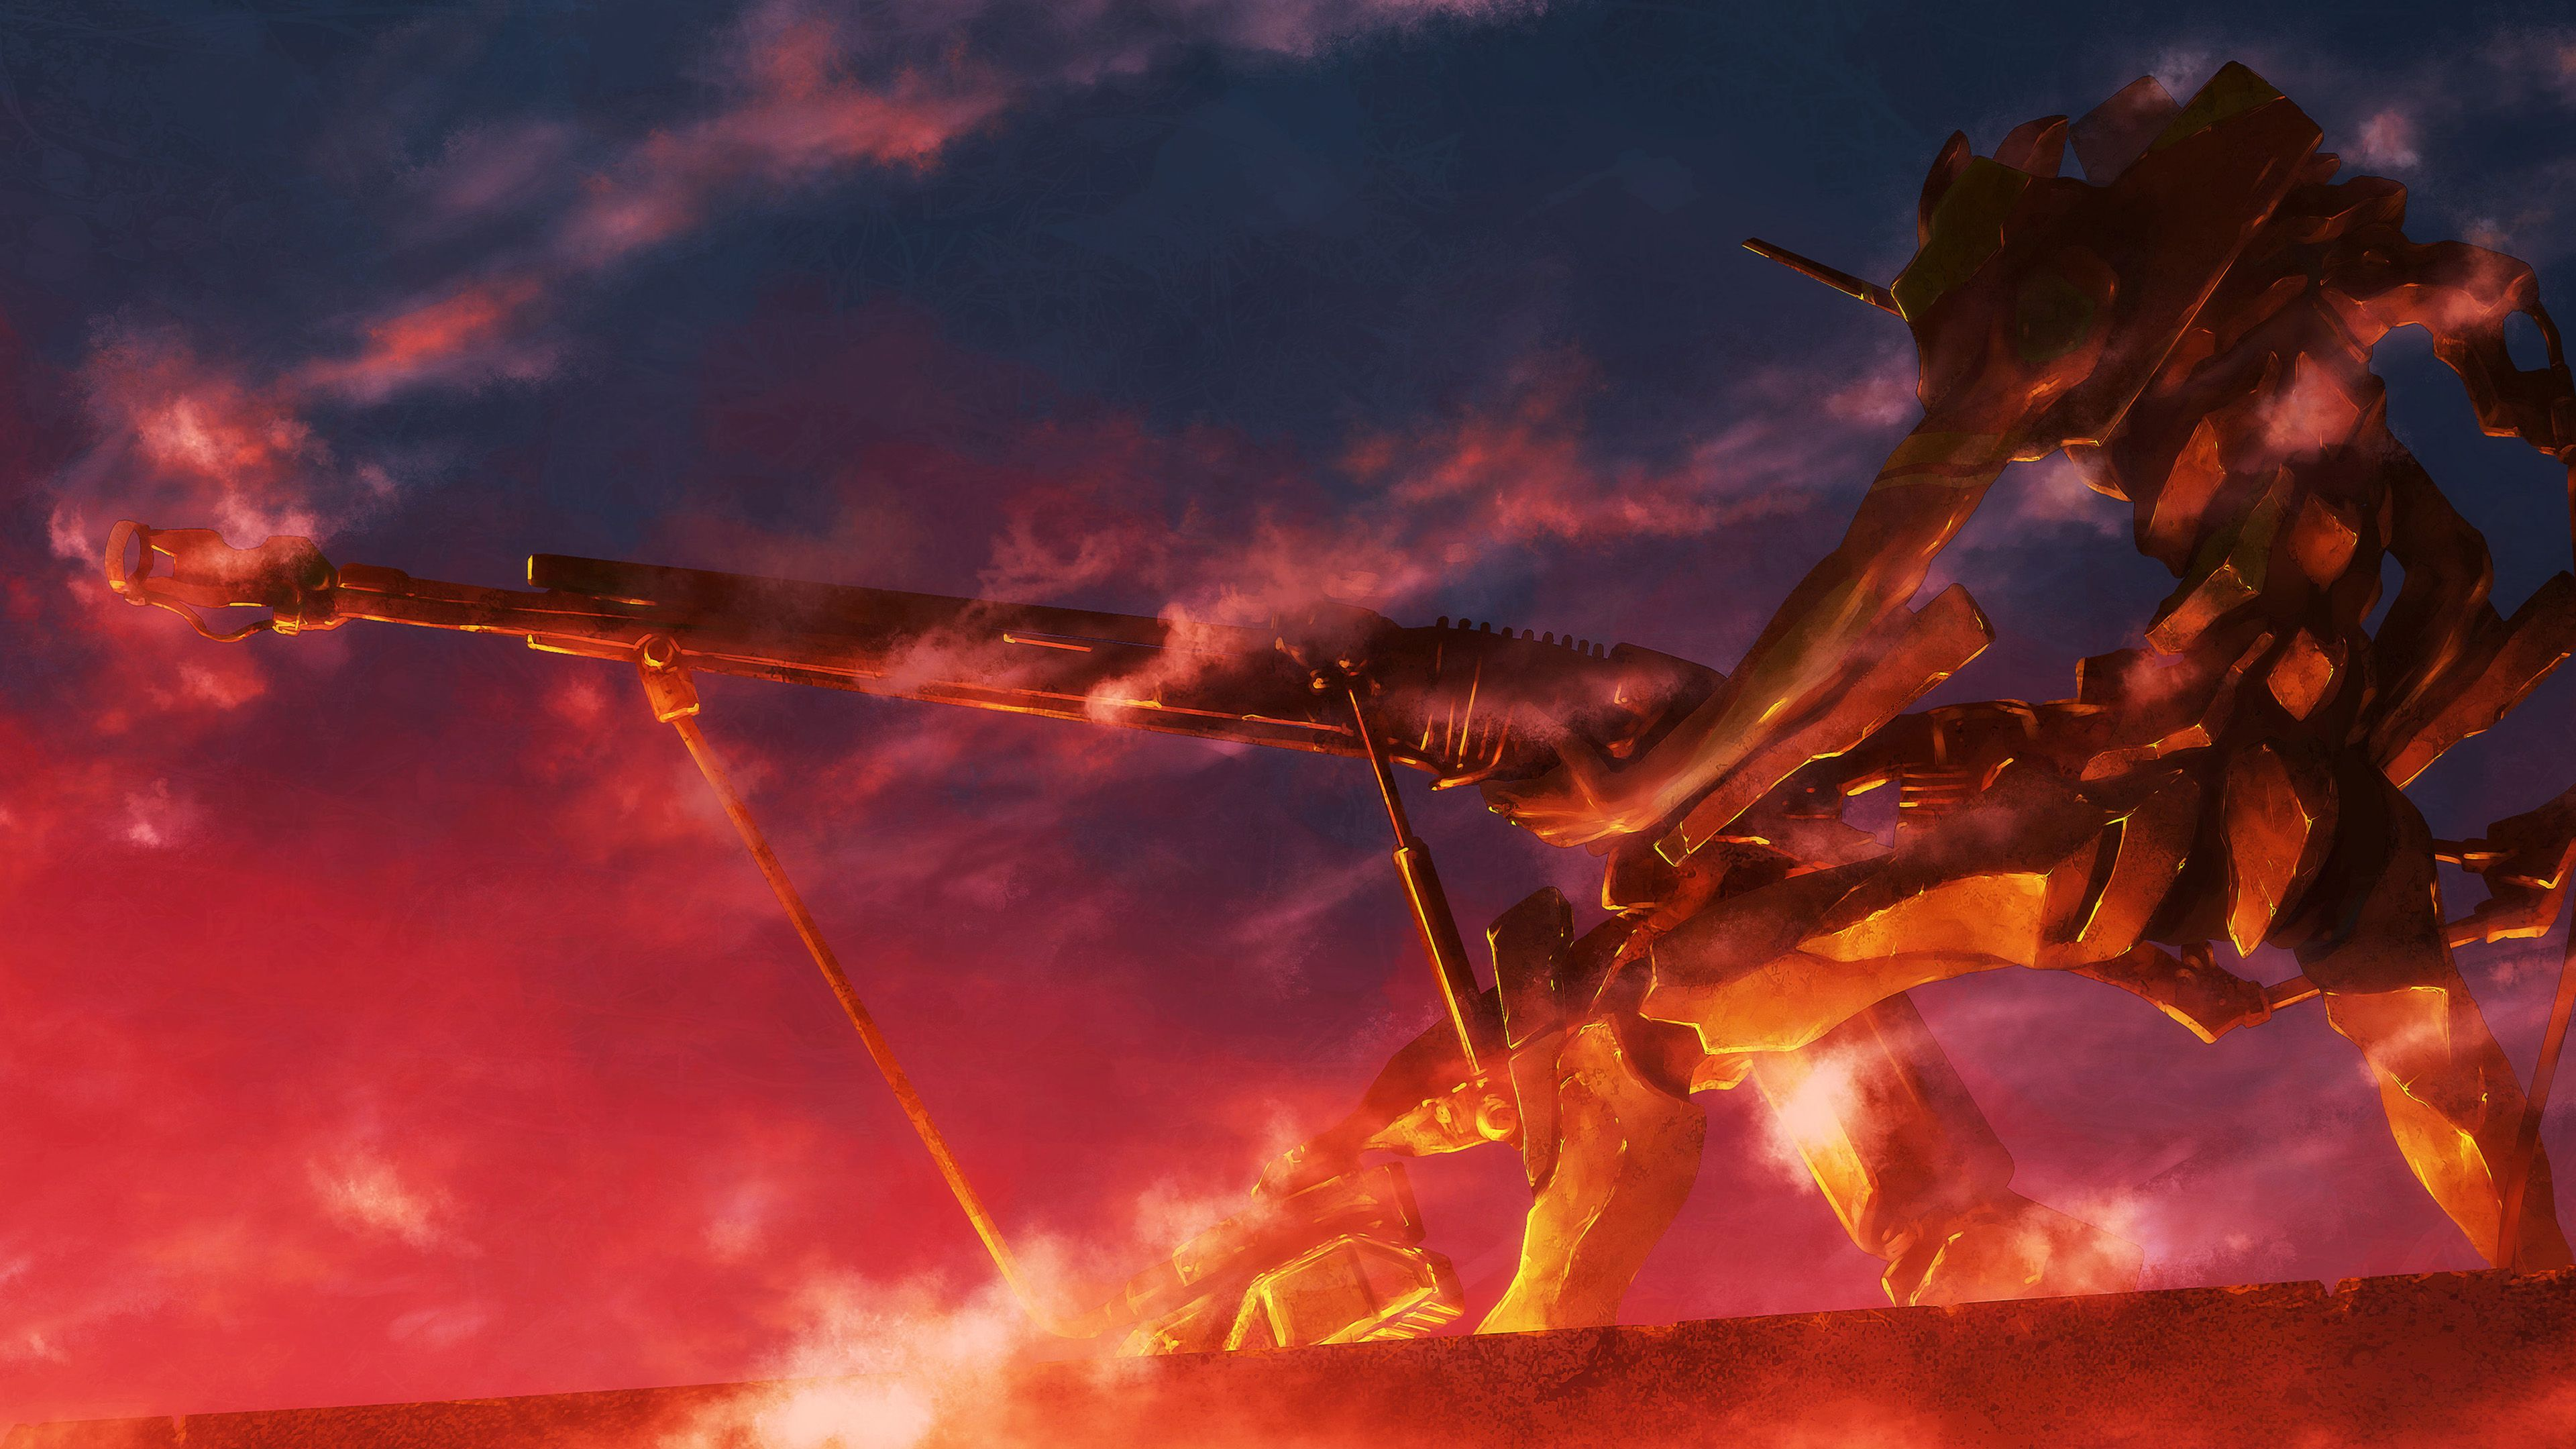 Evangelion 4K Wallpapers - Top Free Evangelion 4K ...